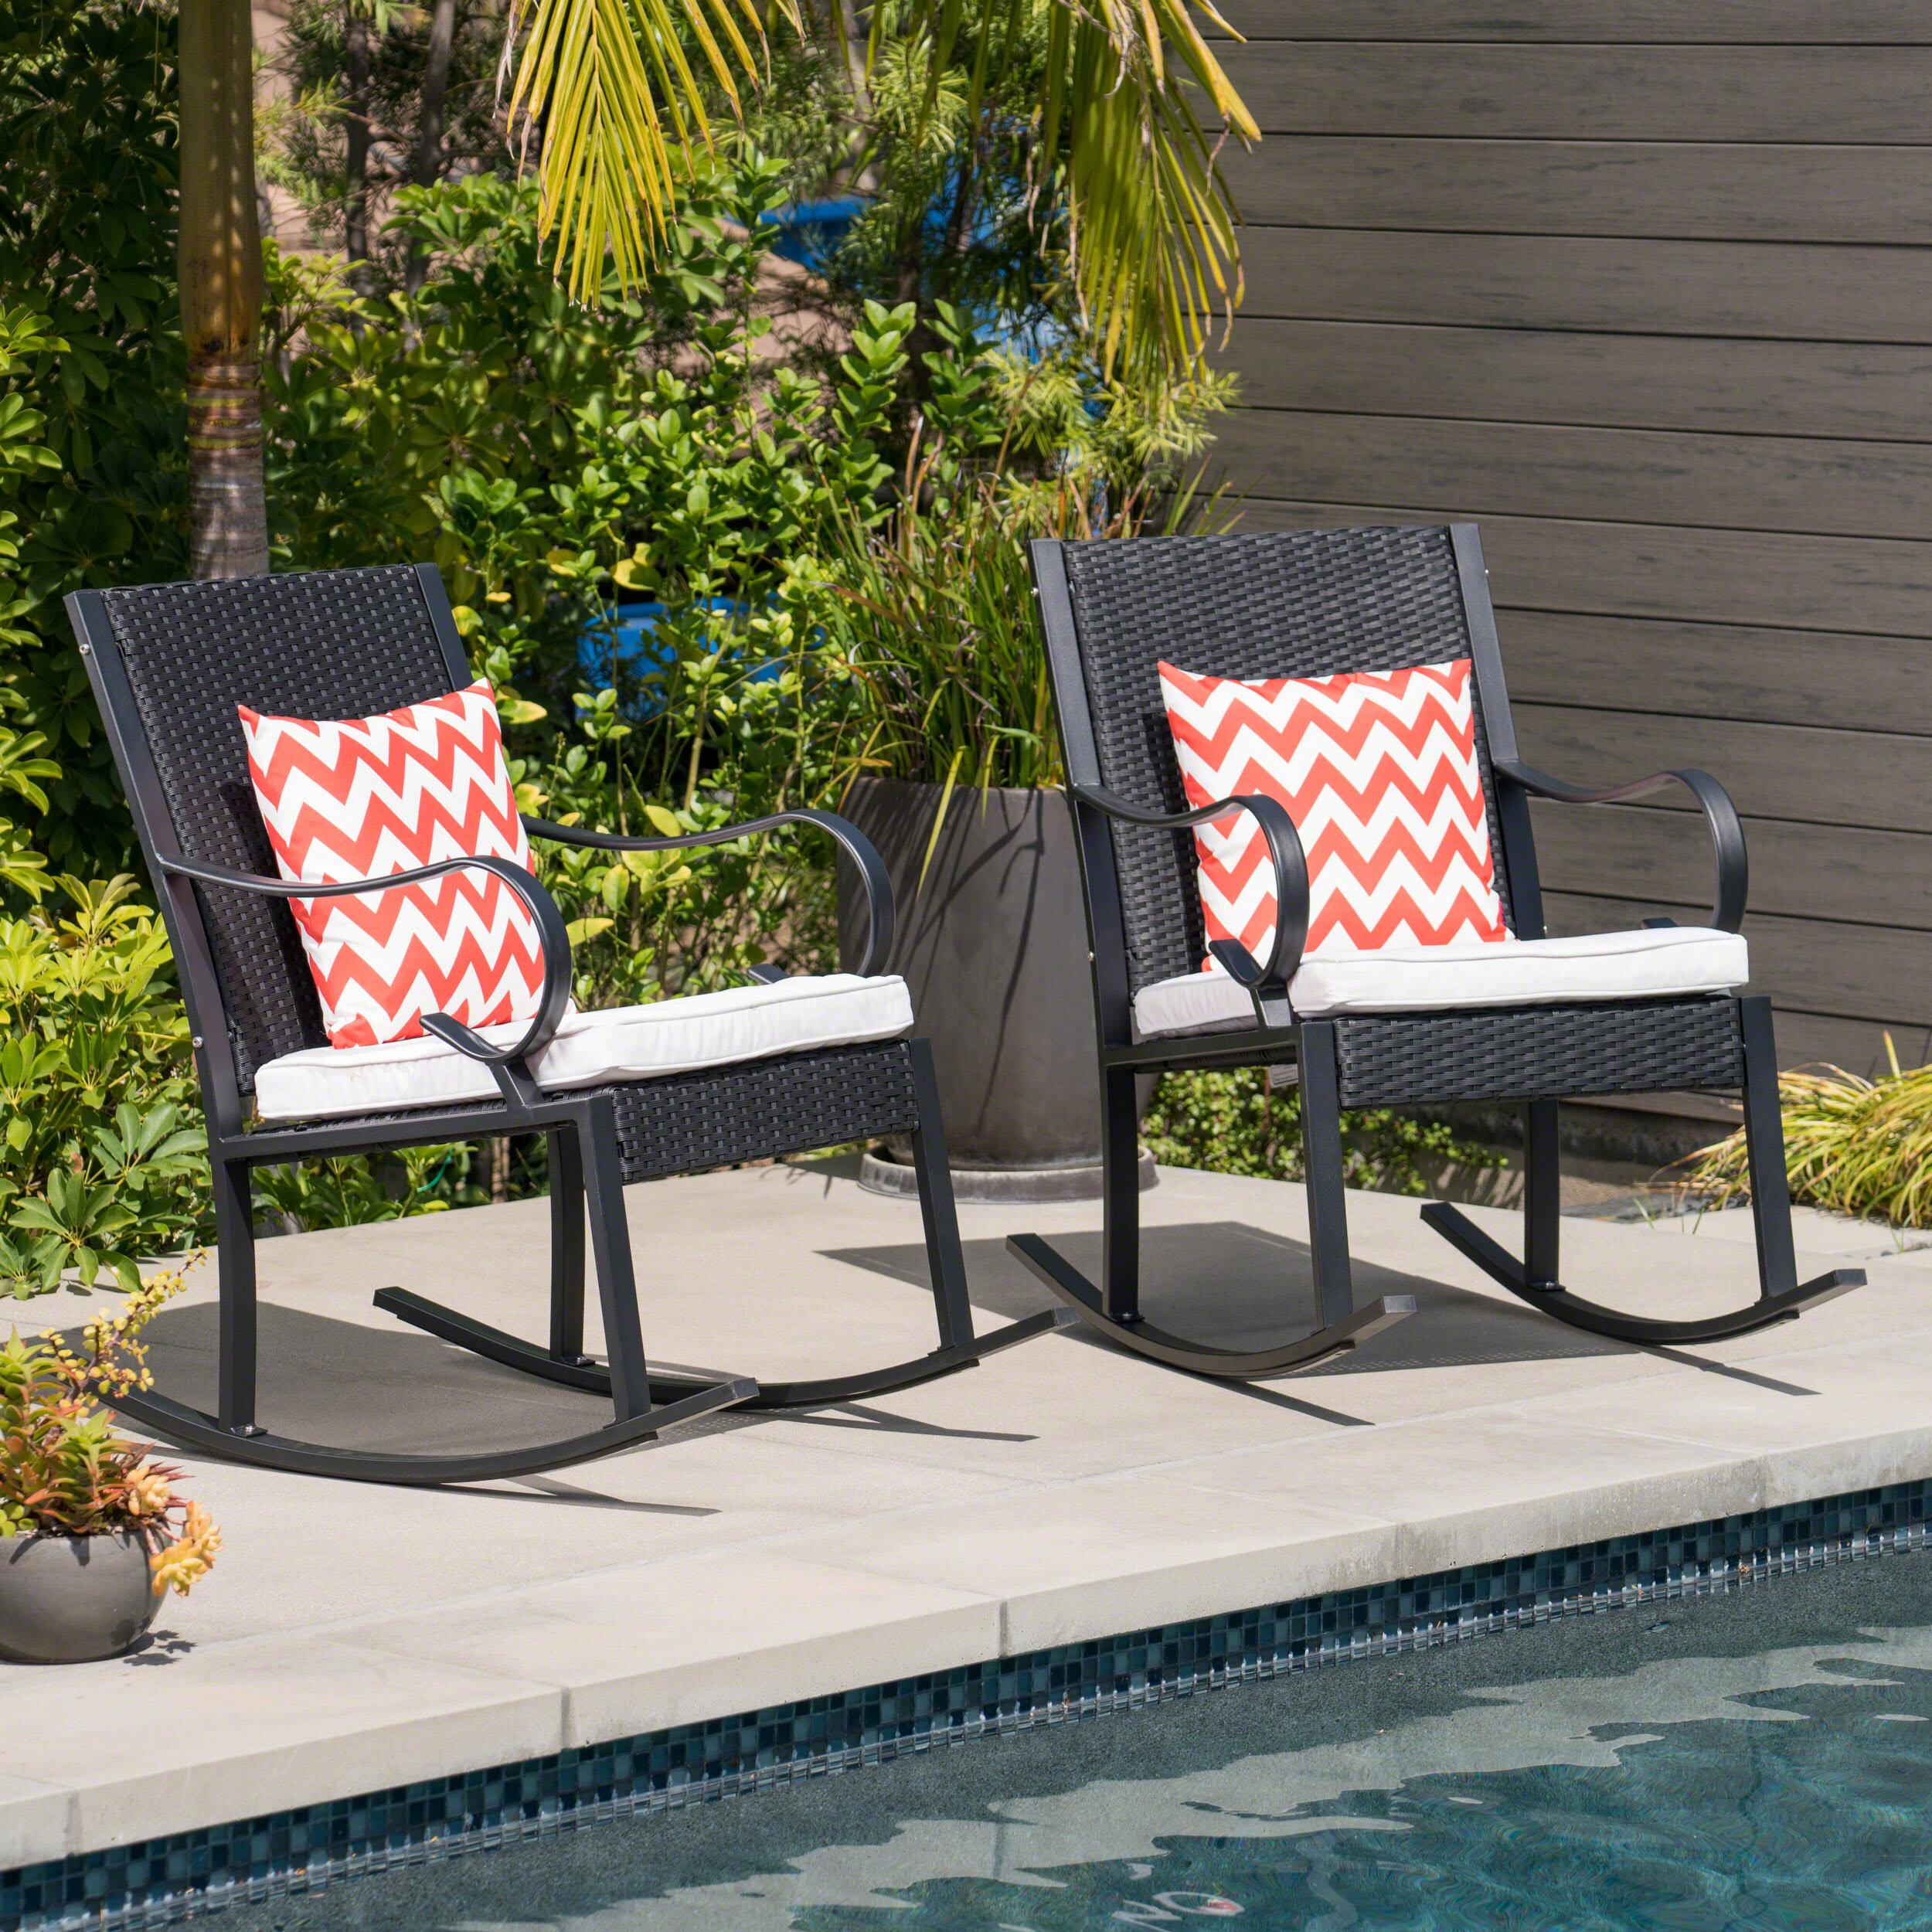 Genial Kampmann Outdoor Wicker Rocking Chair With Cushions